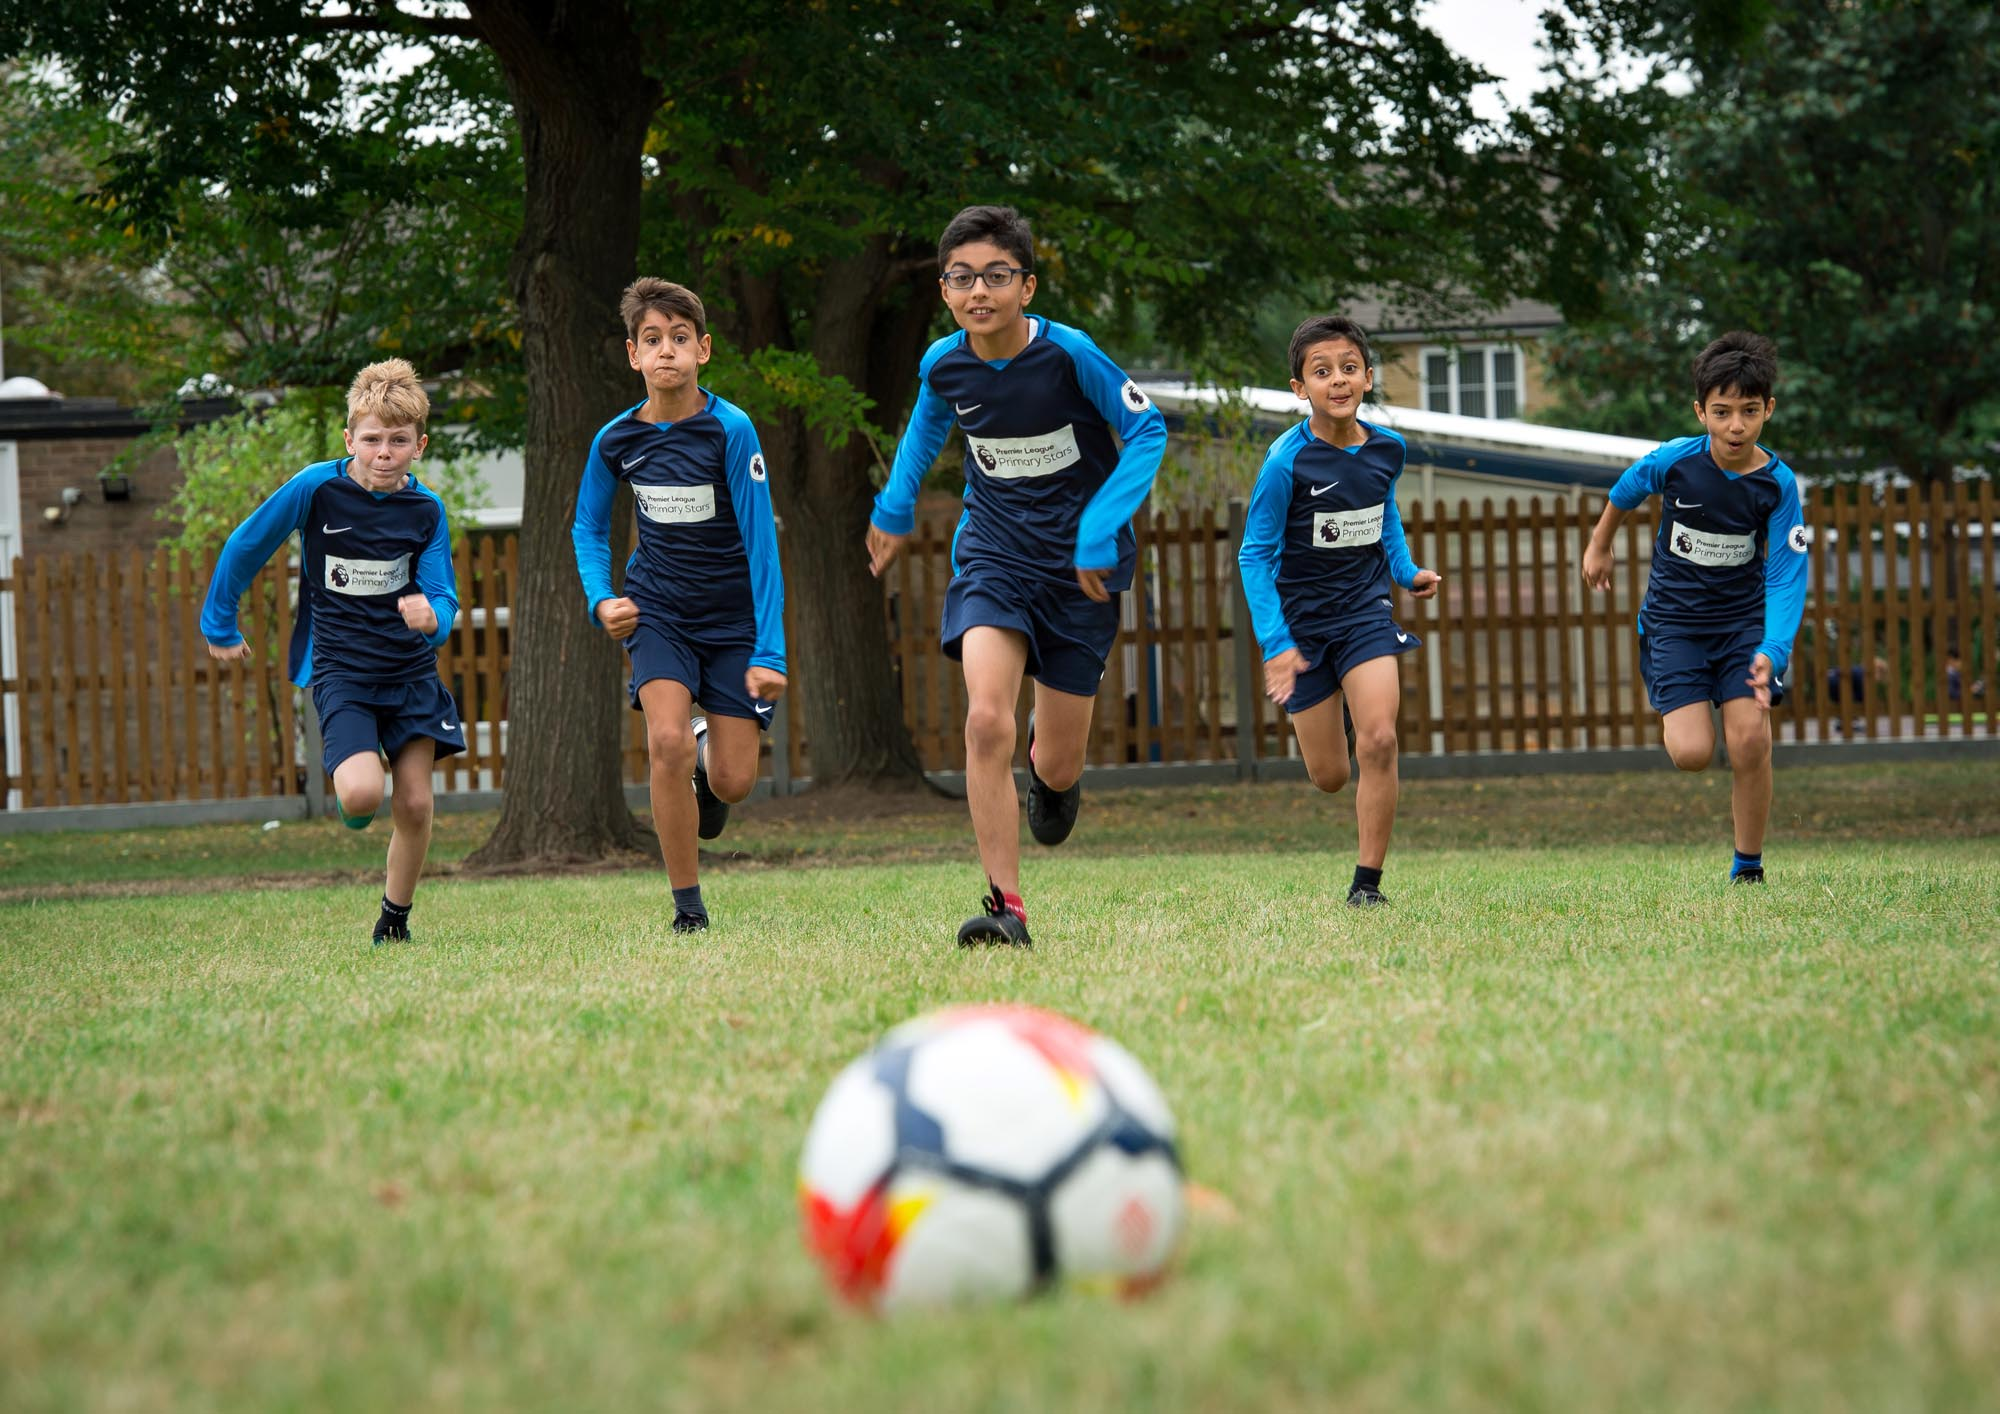 Football team running towards the ball